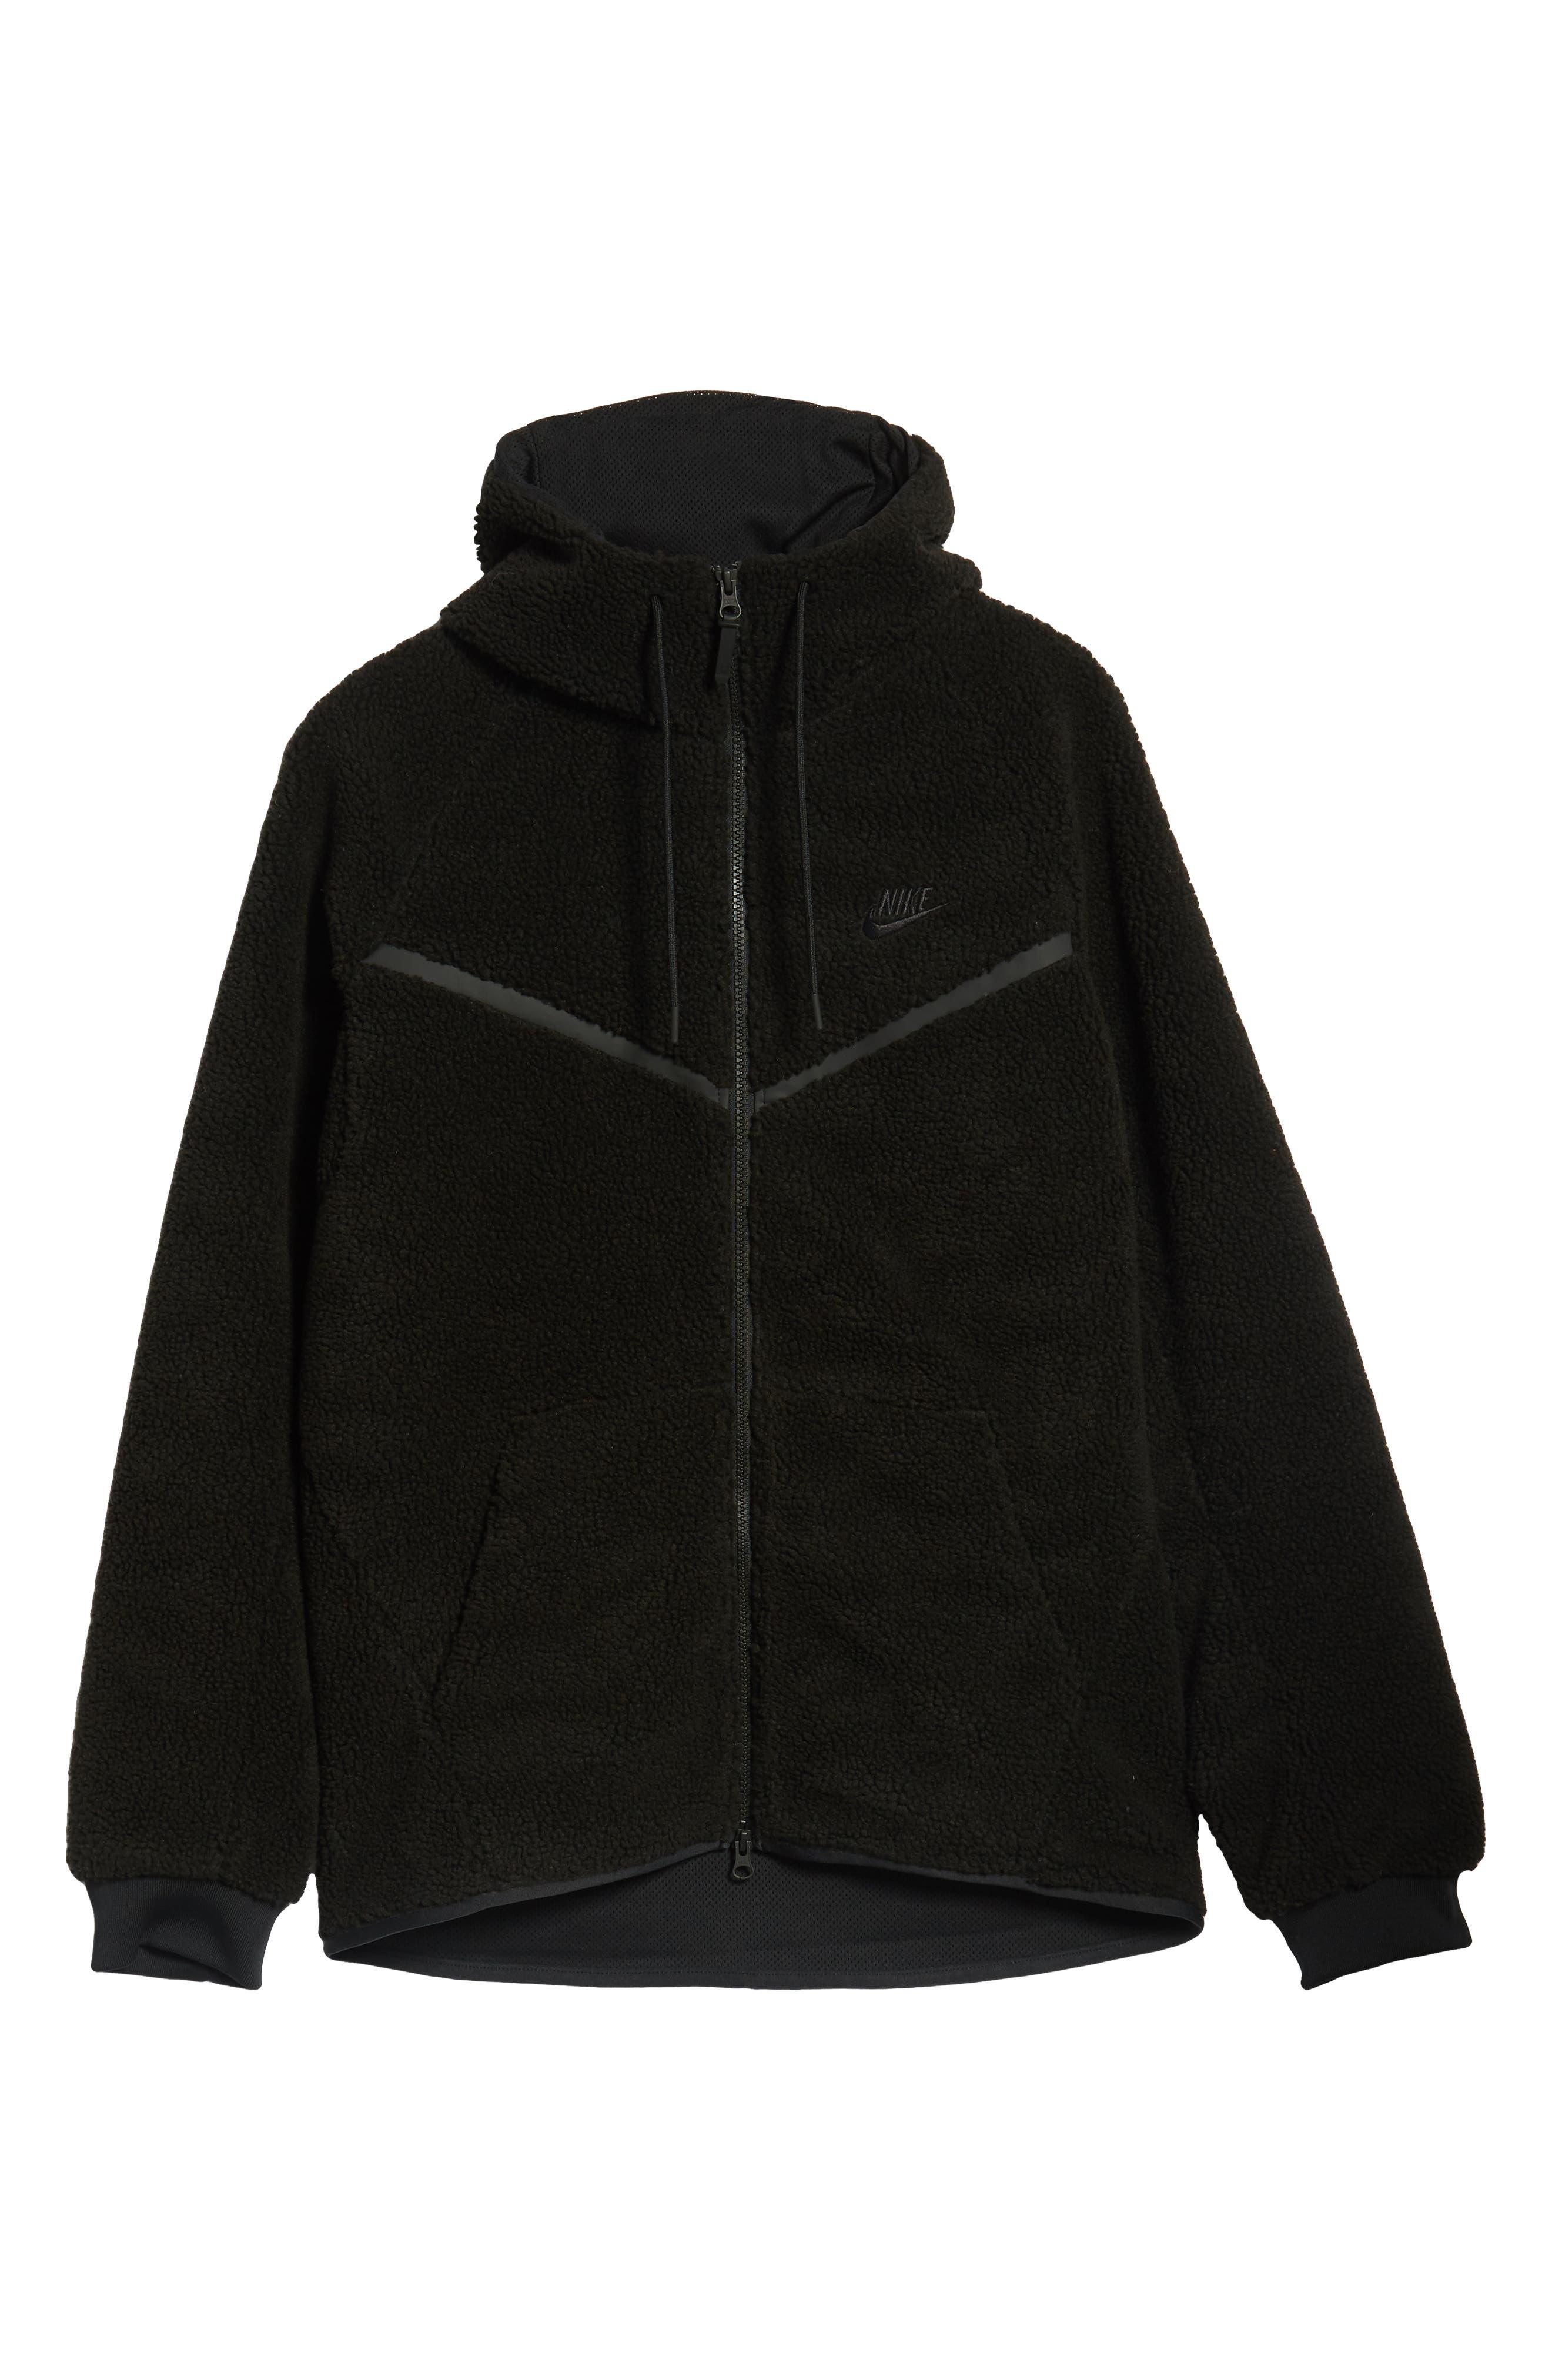 NIKE, Tech Icon Fleece Zip Hoodie, Alternate thumbnail 7, color, BLACK/ BLACK